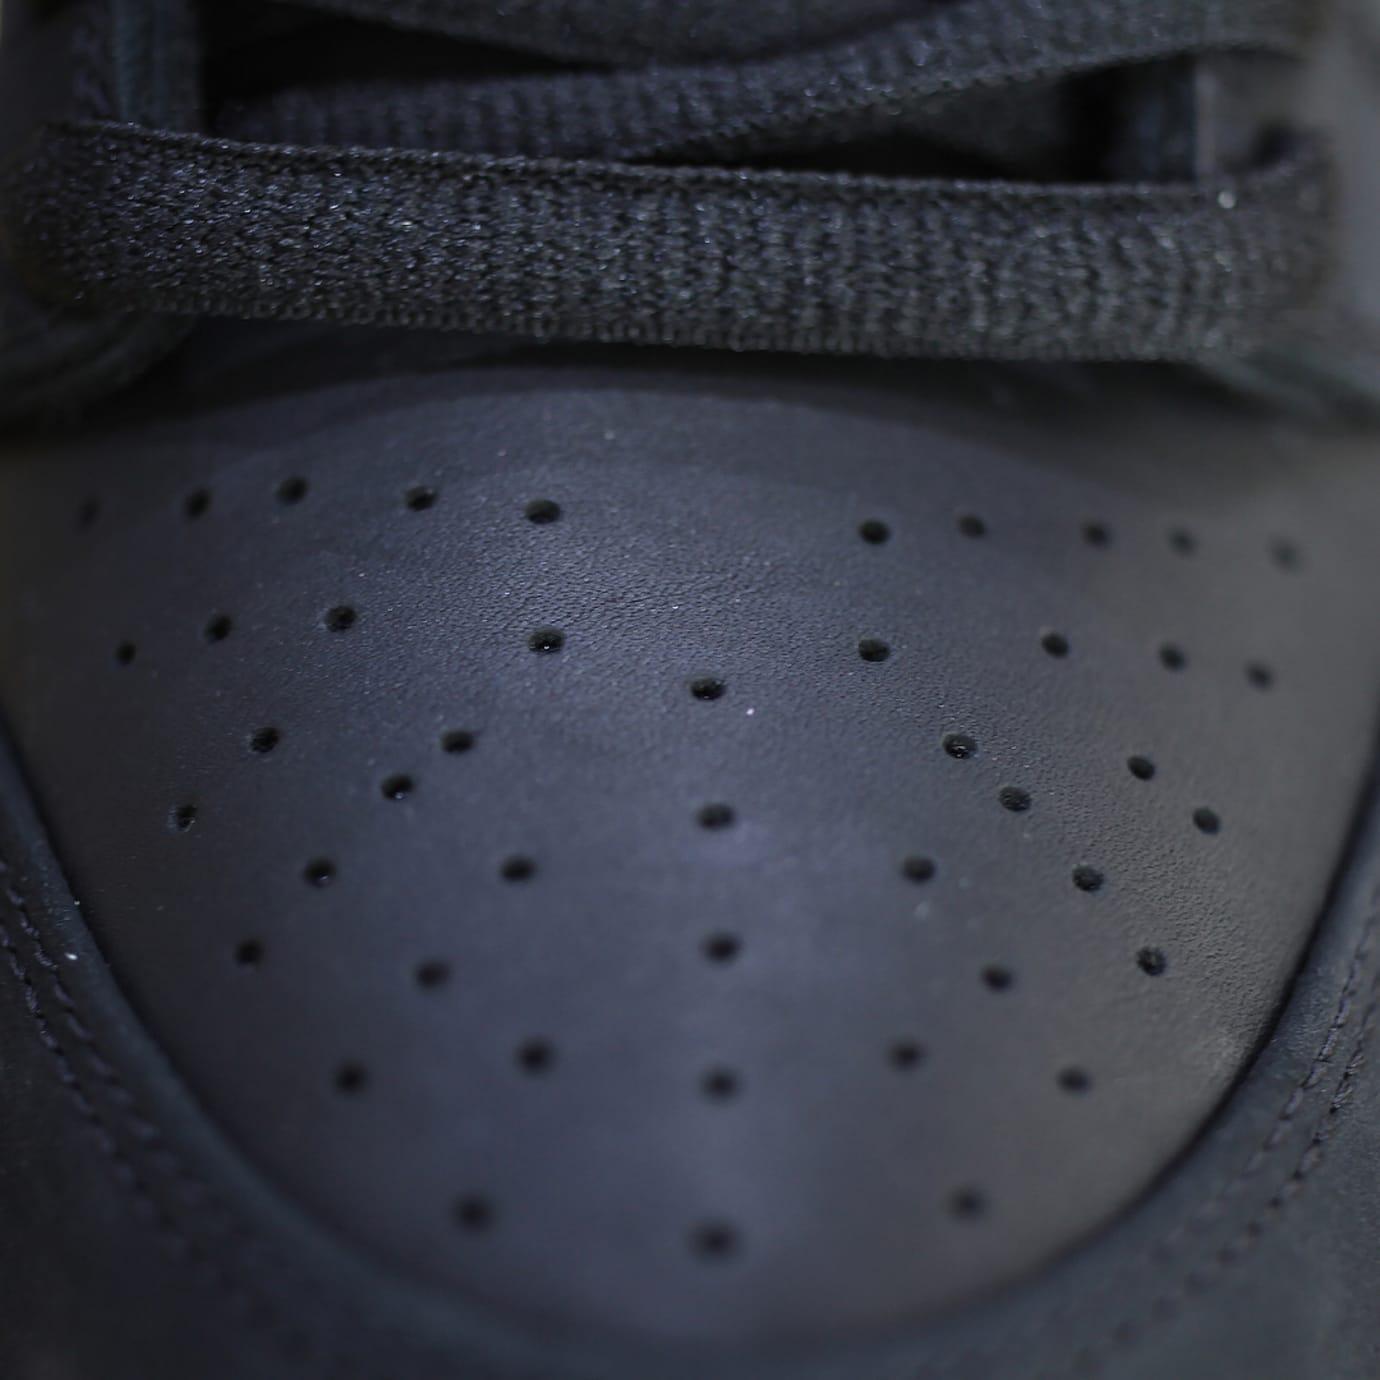 Nike SB Dunk Low Black Pigeon Release Date 88323-008 (12)